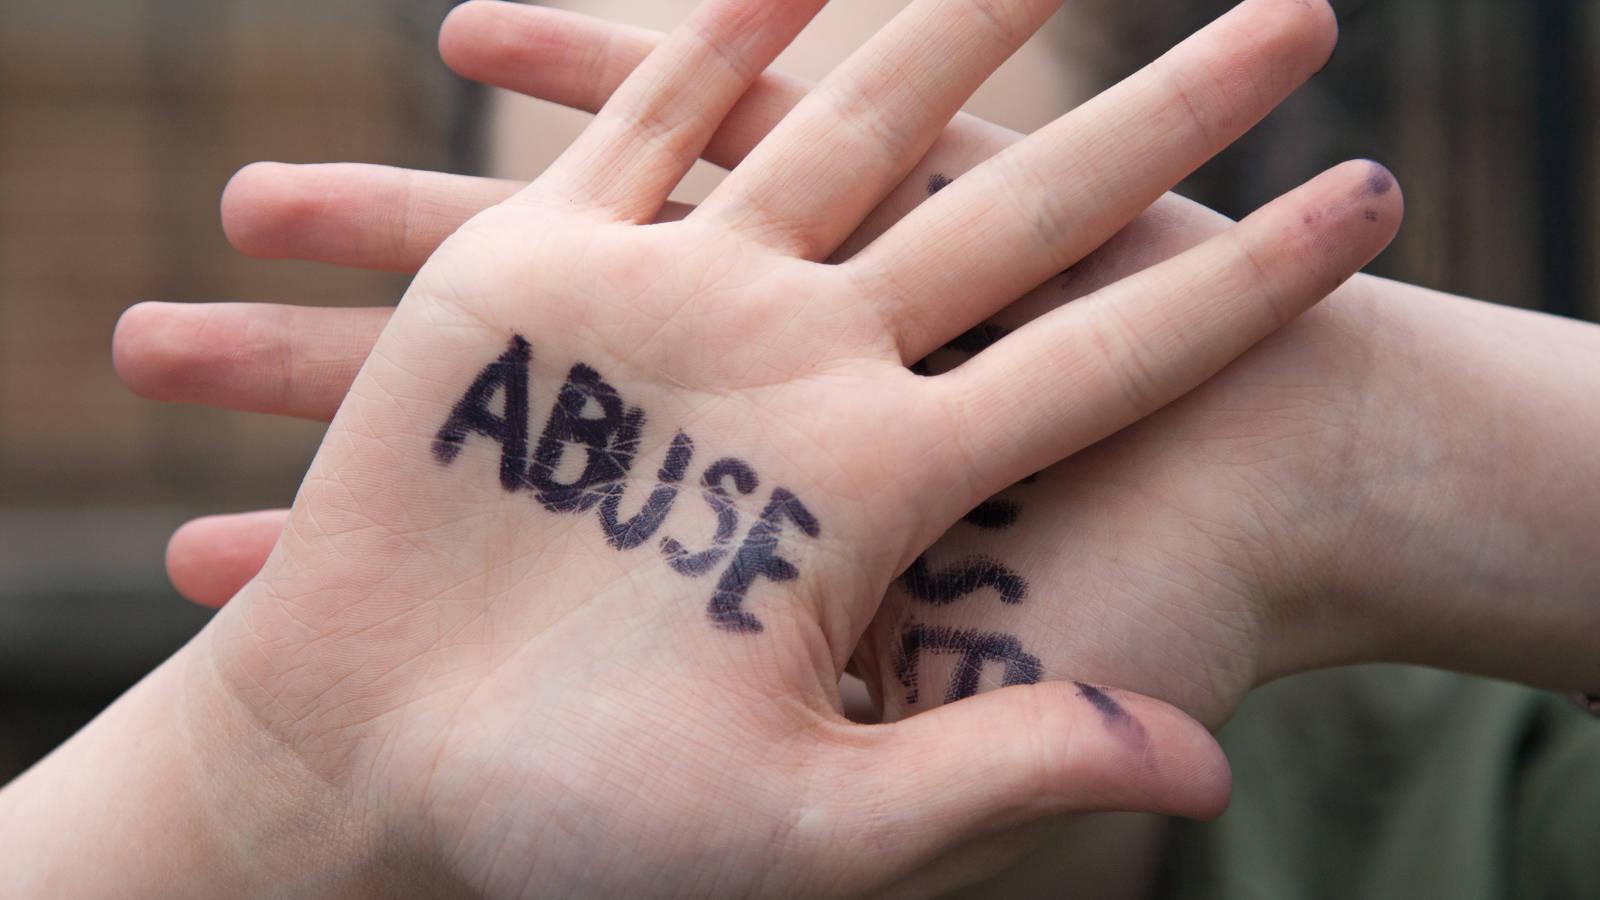 Abuse written on a hand